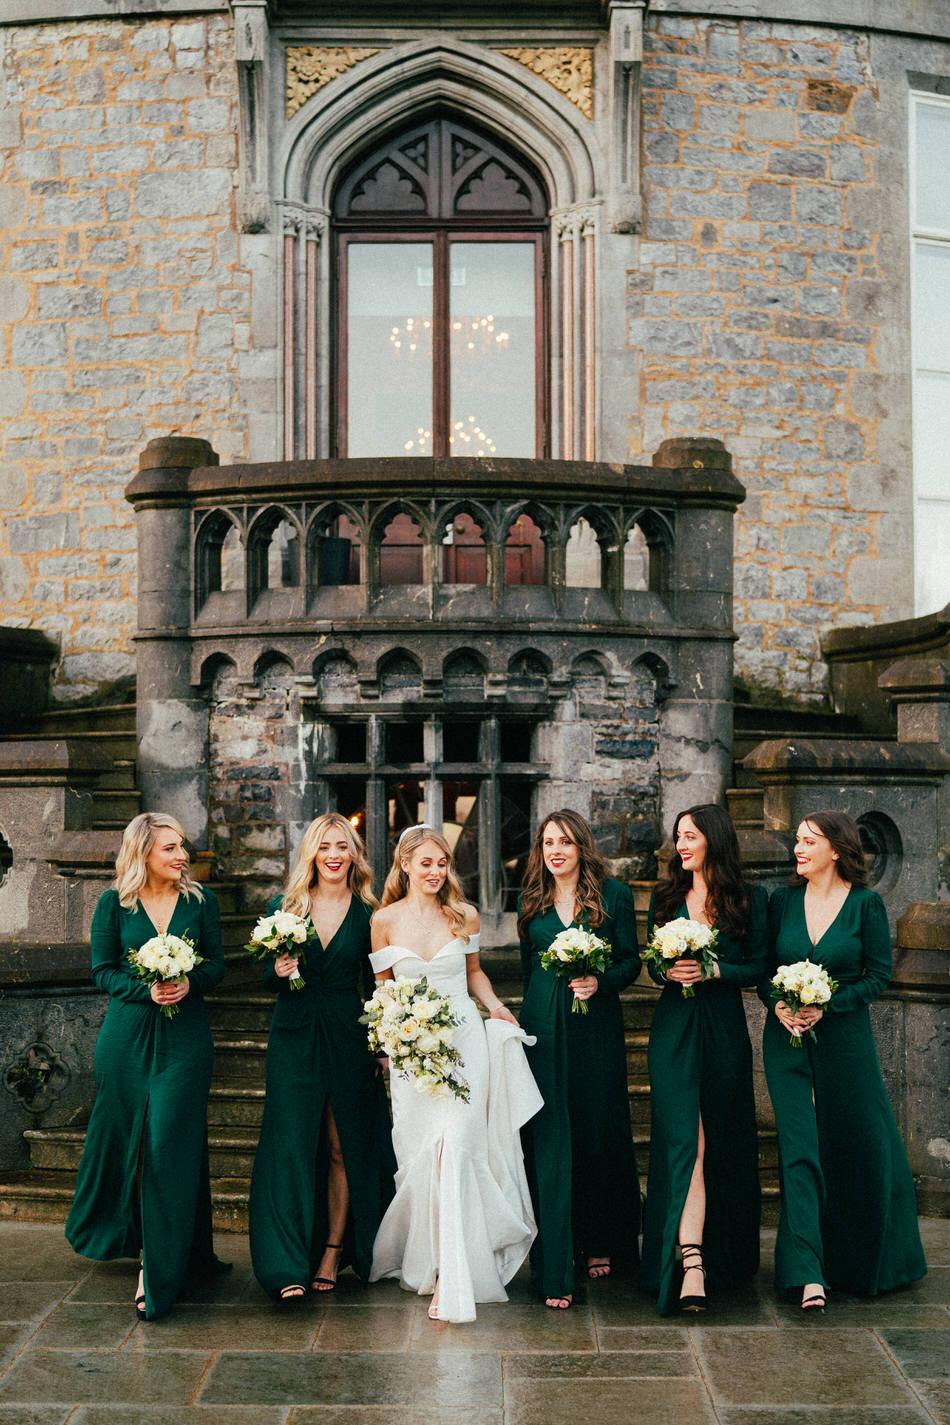 Castle-wedding-ireland-photos- 0213 153